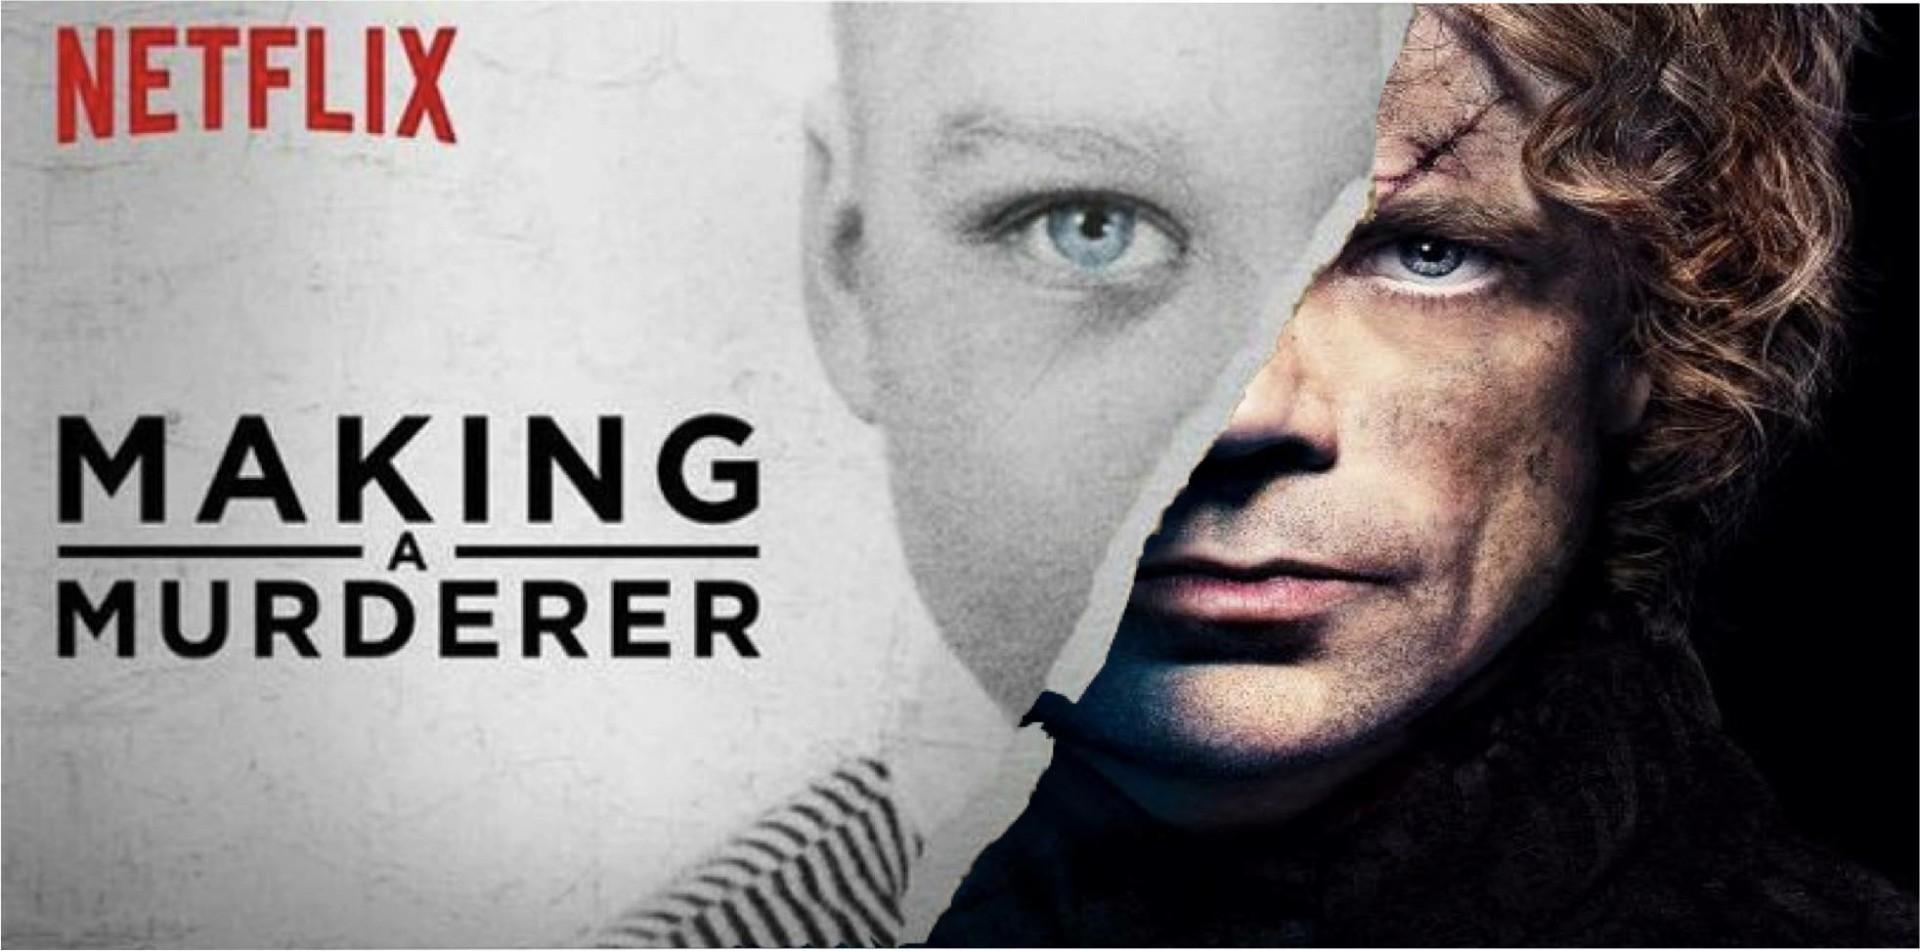 Tyrion Lannister - Making a Murderer